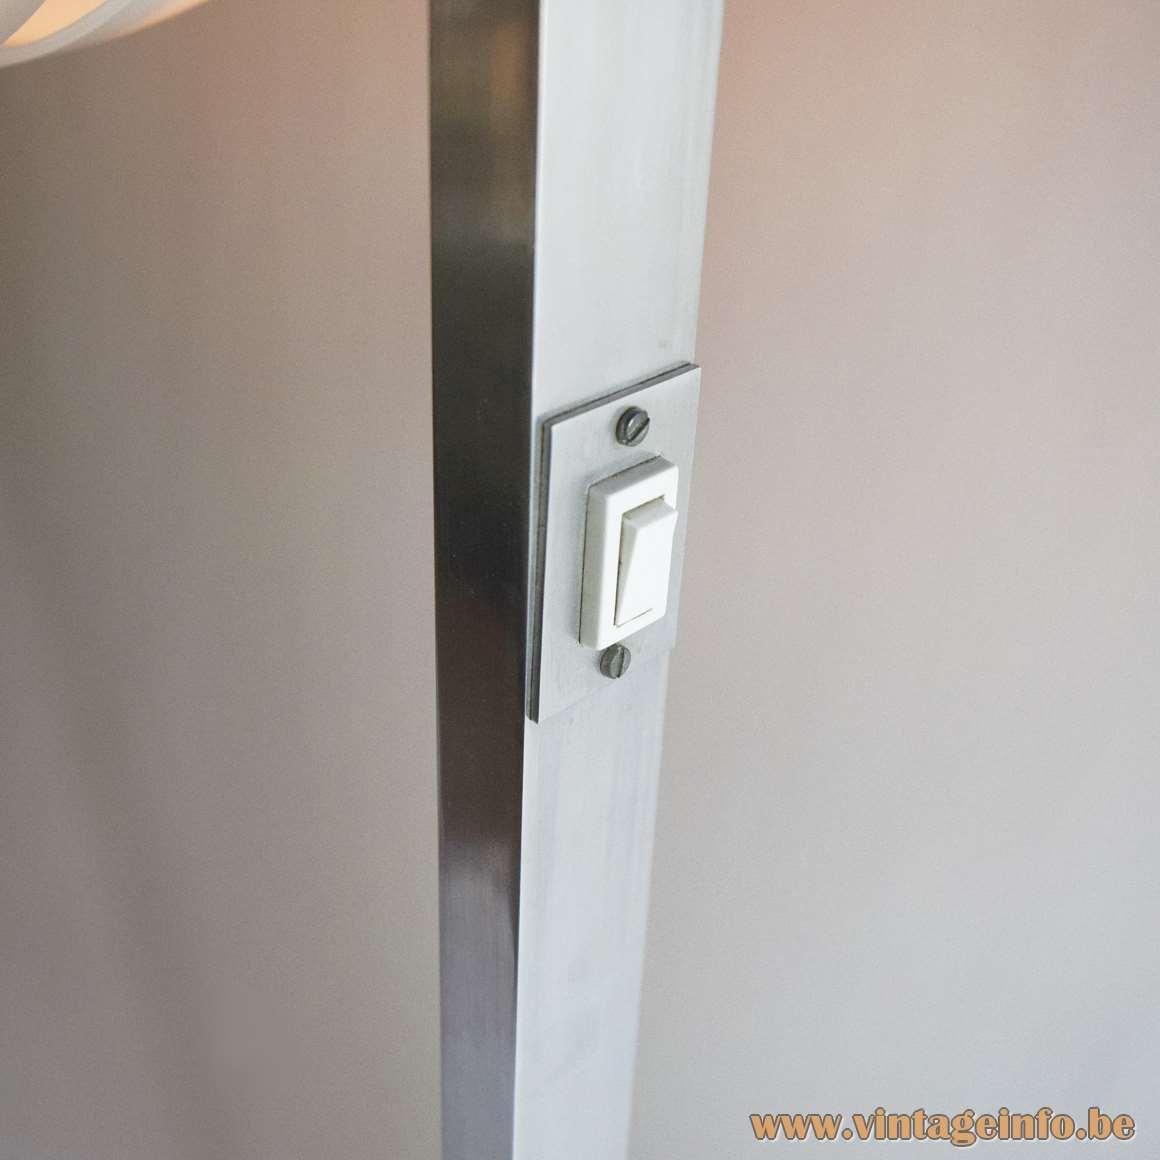 Acrylic Globe Floor Lamp - Acciarri switch